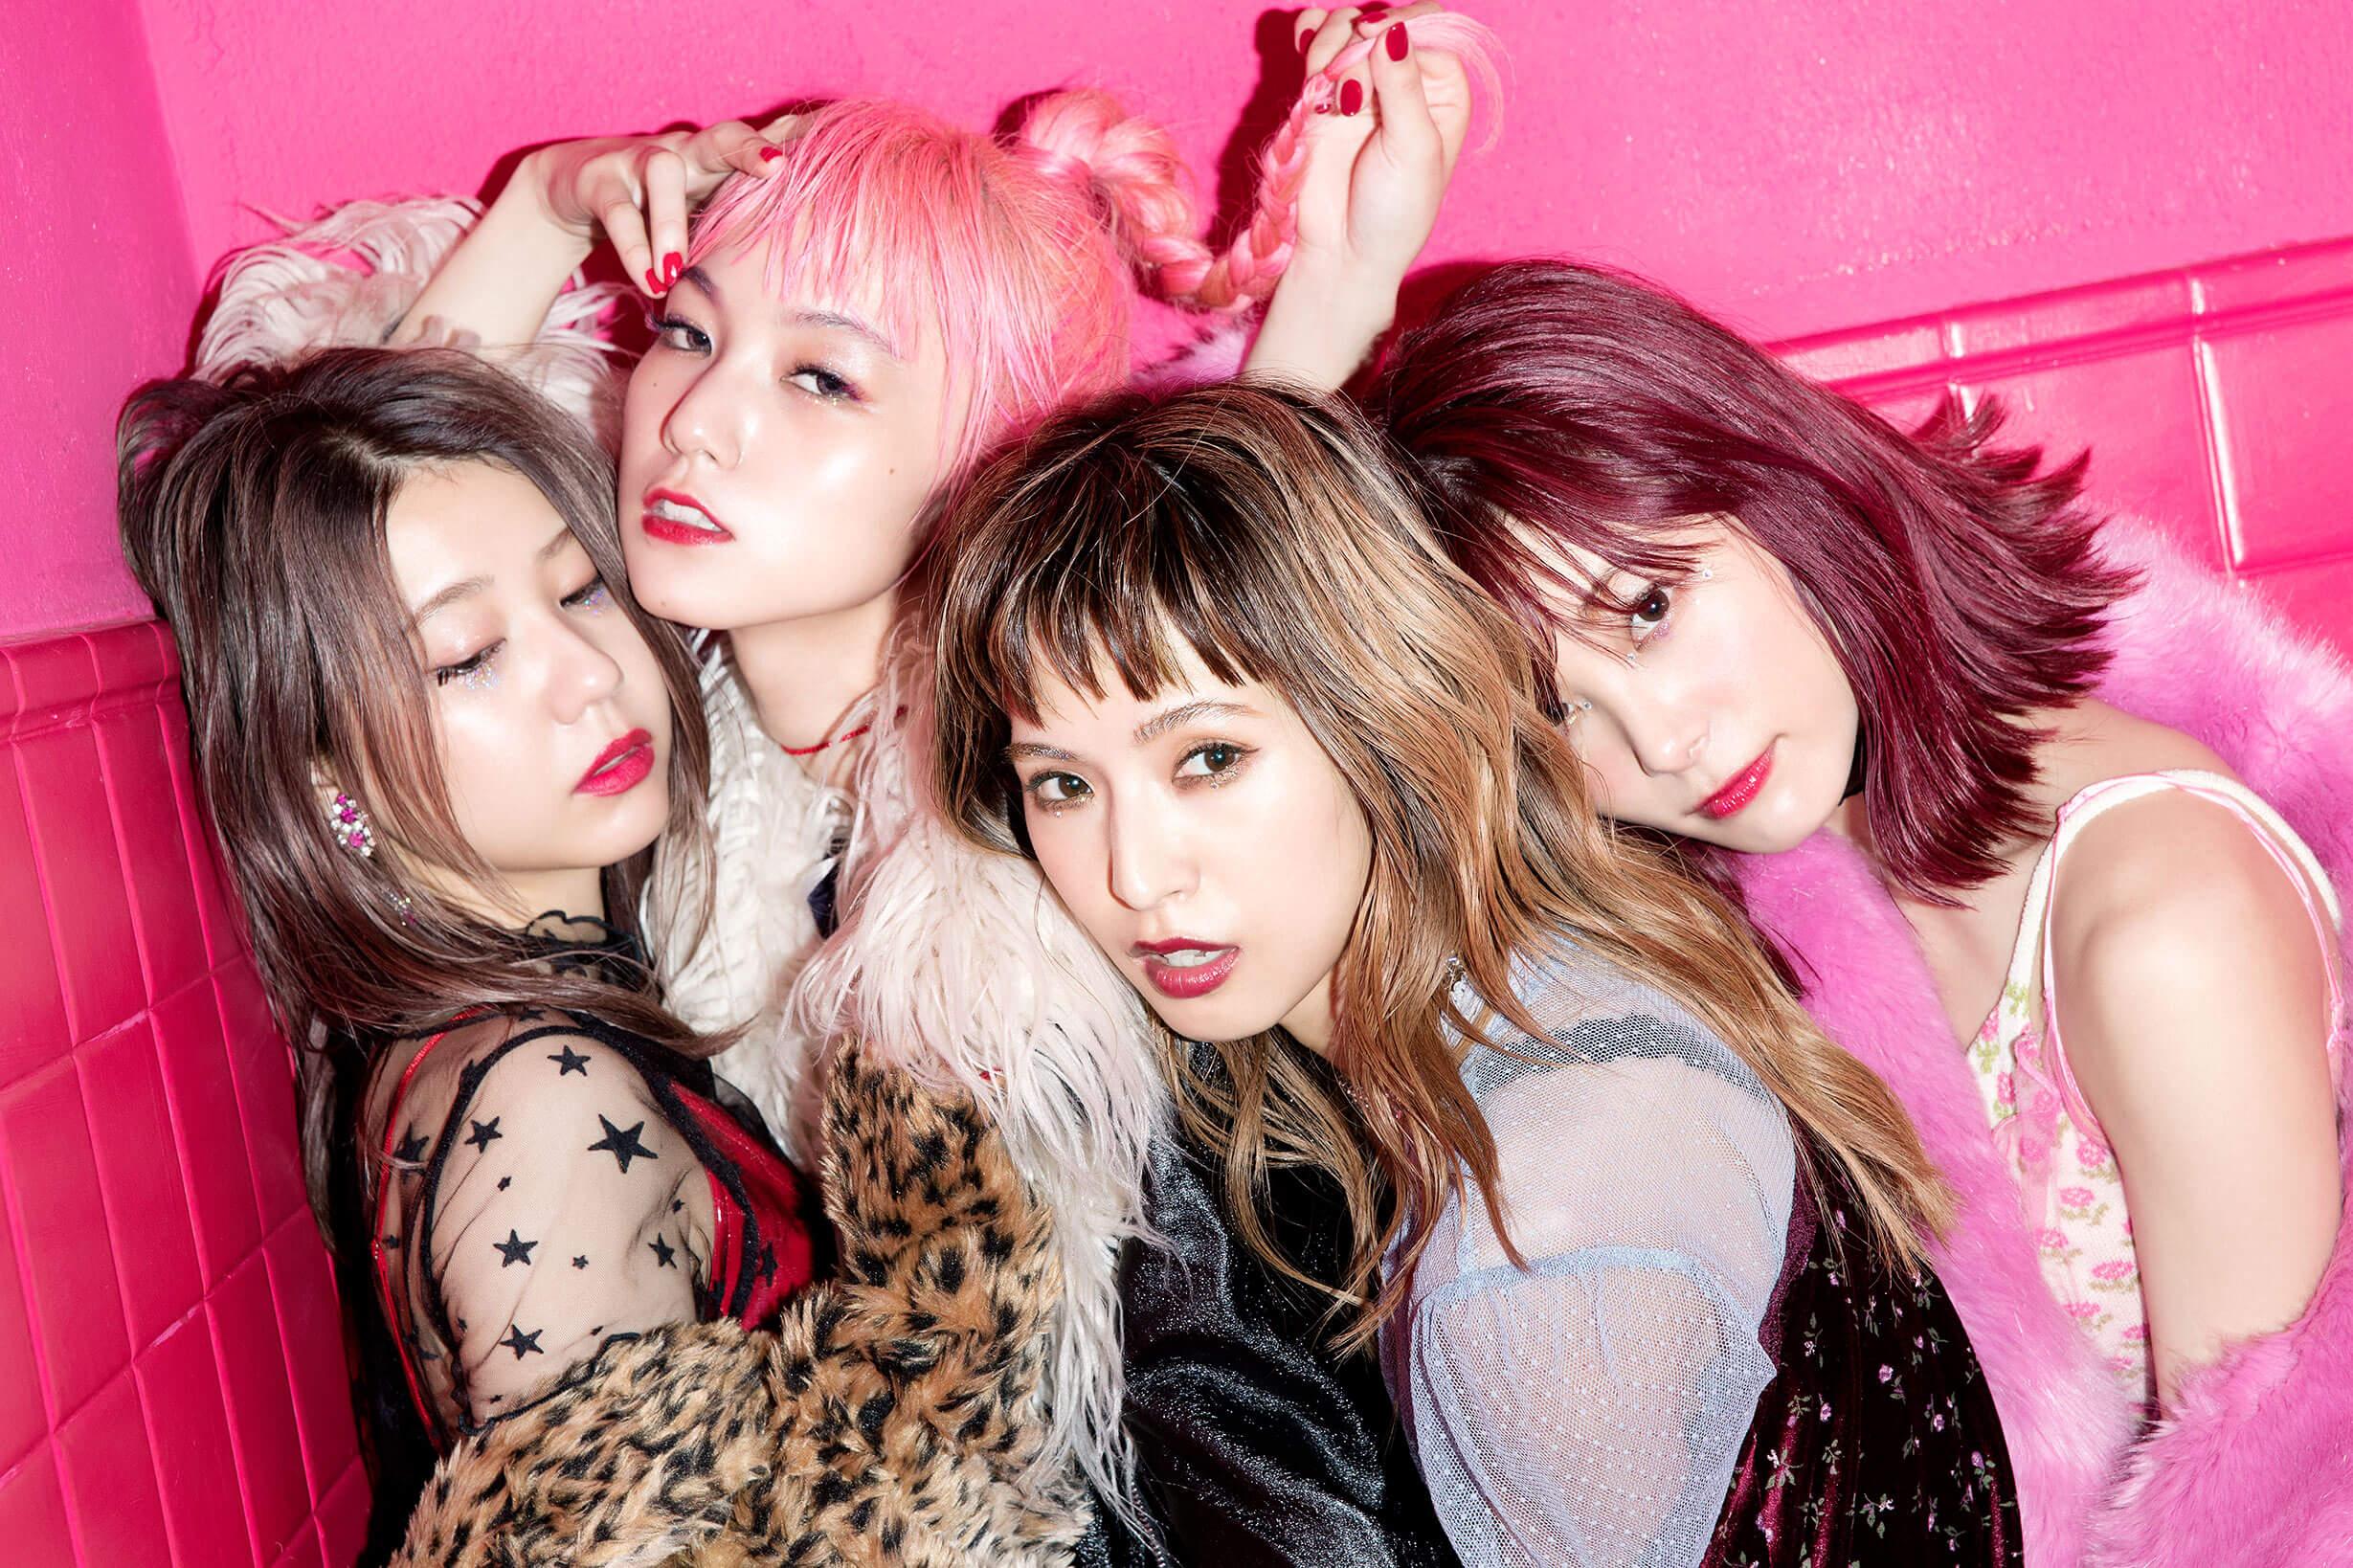 SCANDAL專輯『HONEY』 iTunes開放預約 scandal、